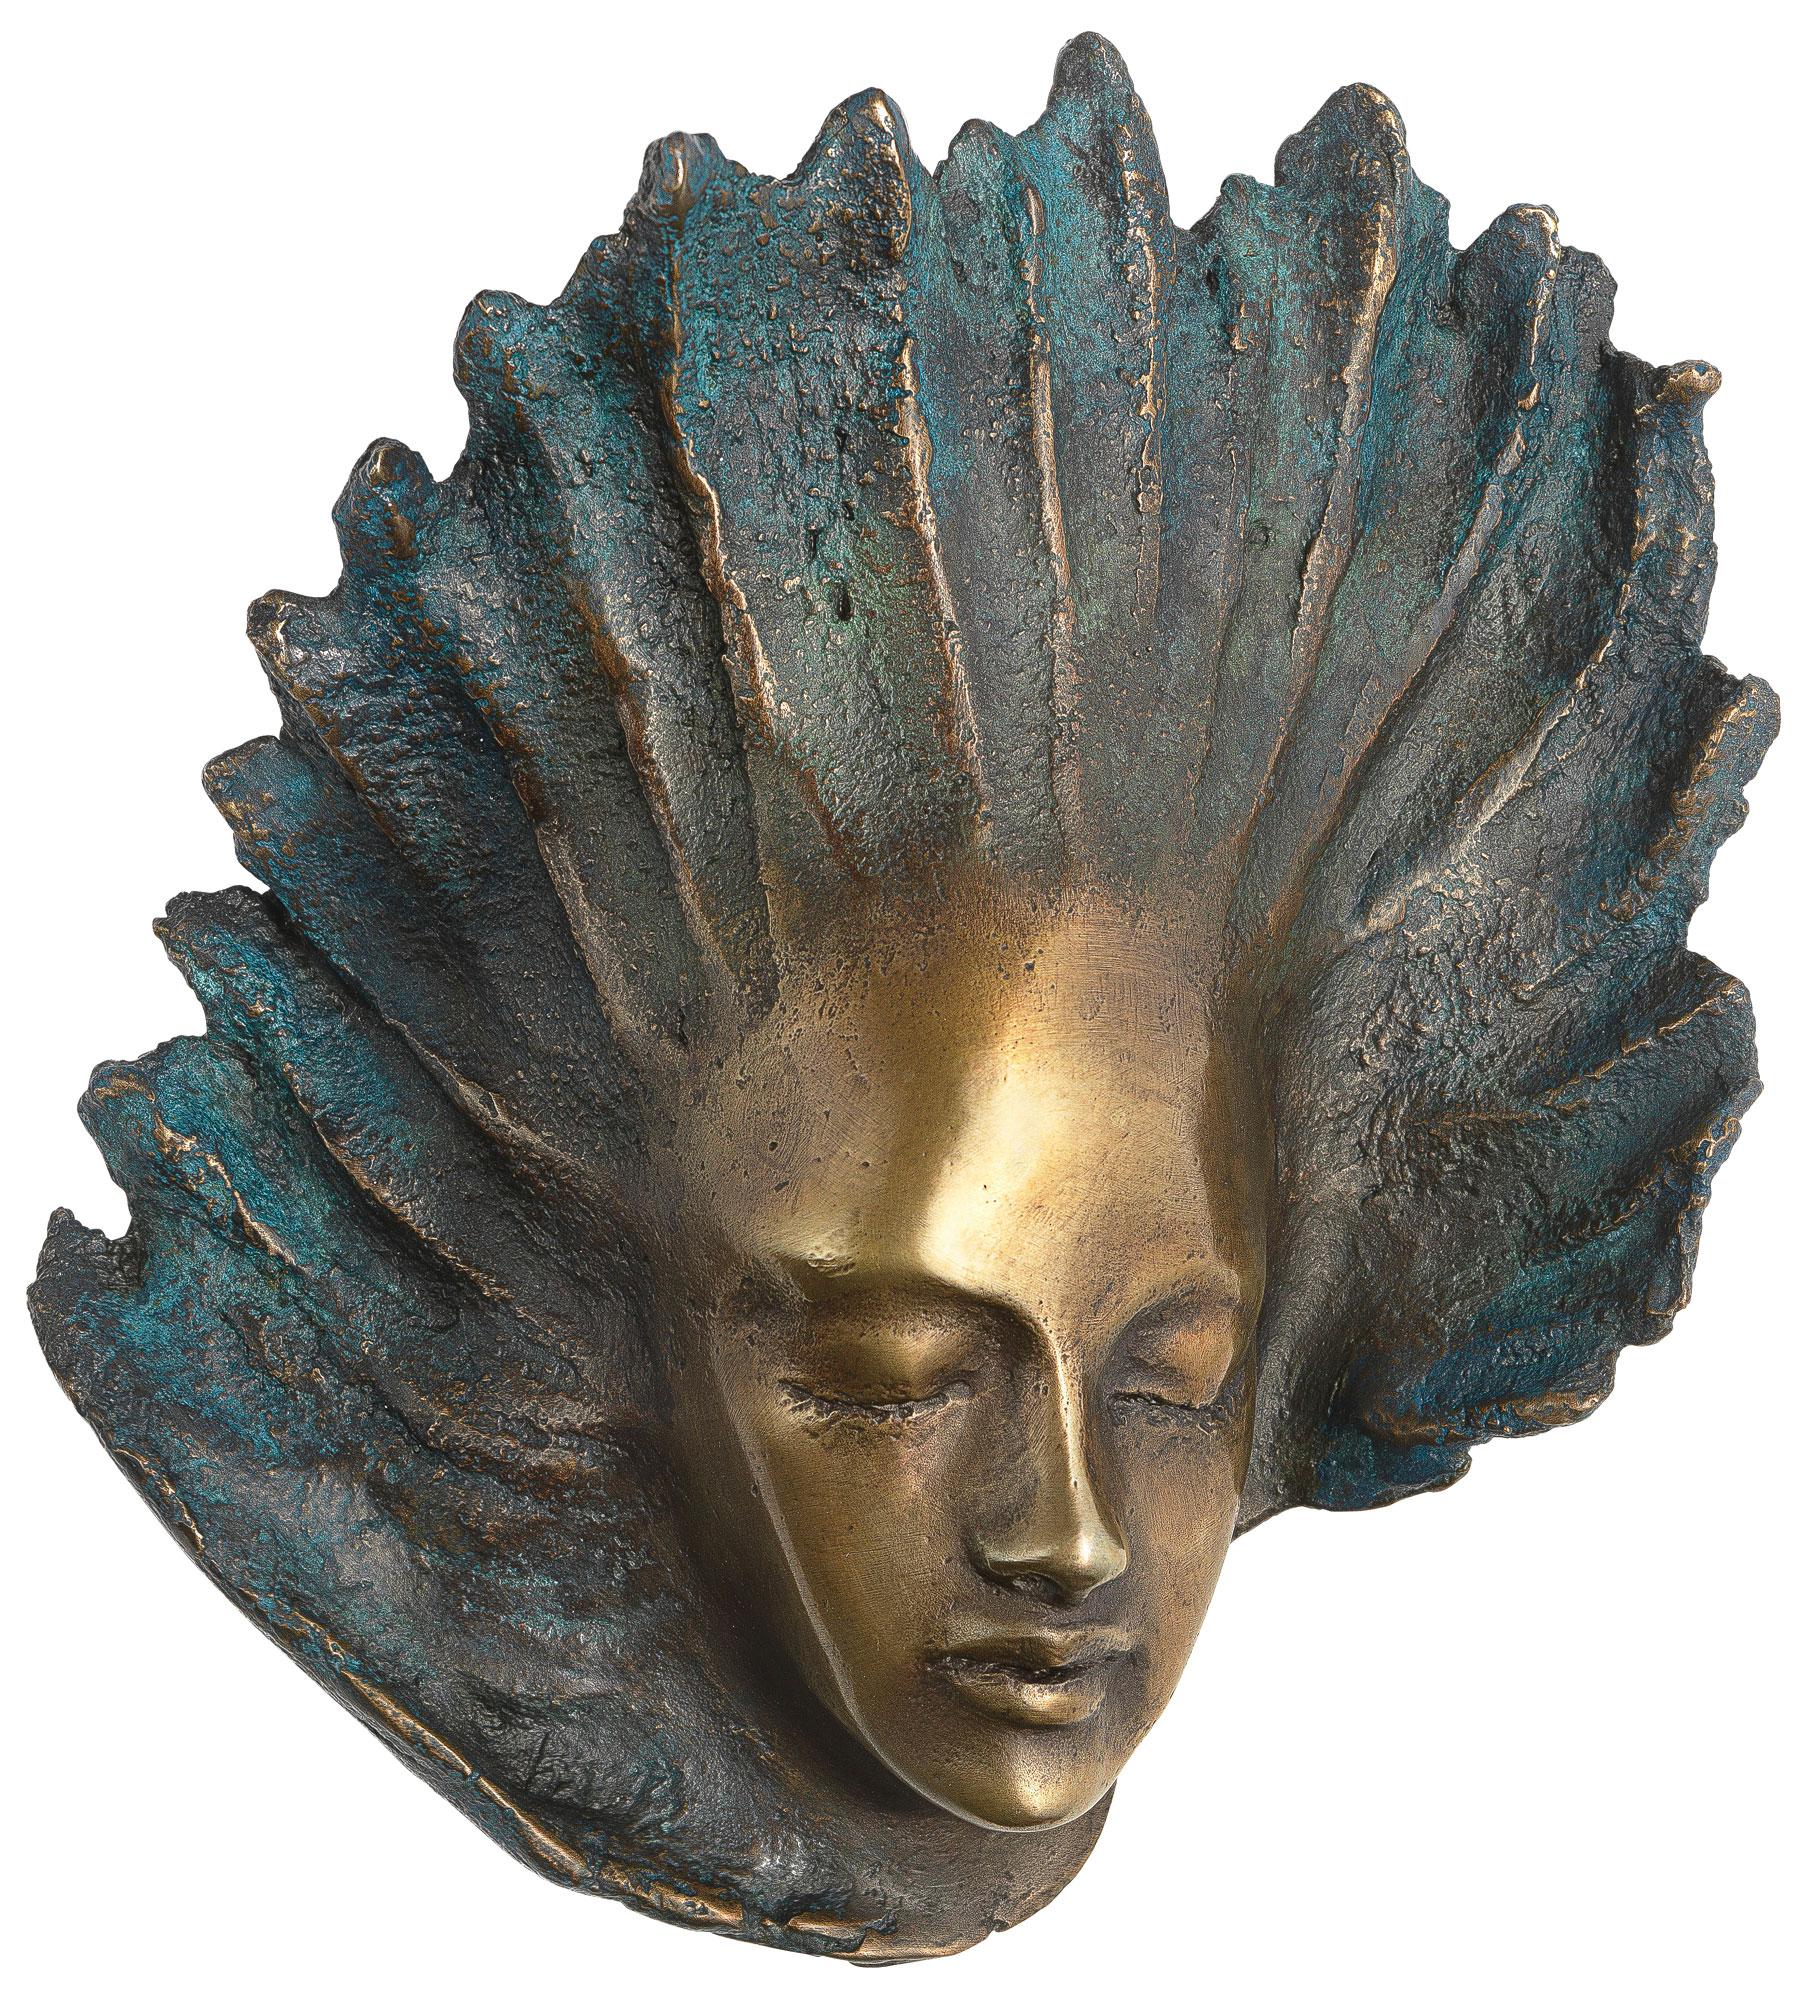 Maria-Luise Bodirsky: Wandskulptur 'Engel', Version in Bronze